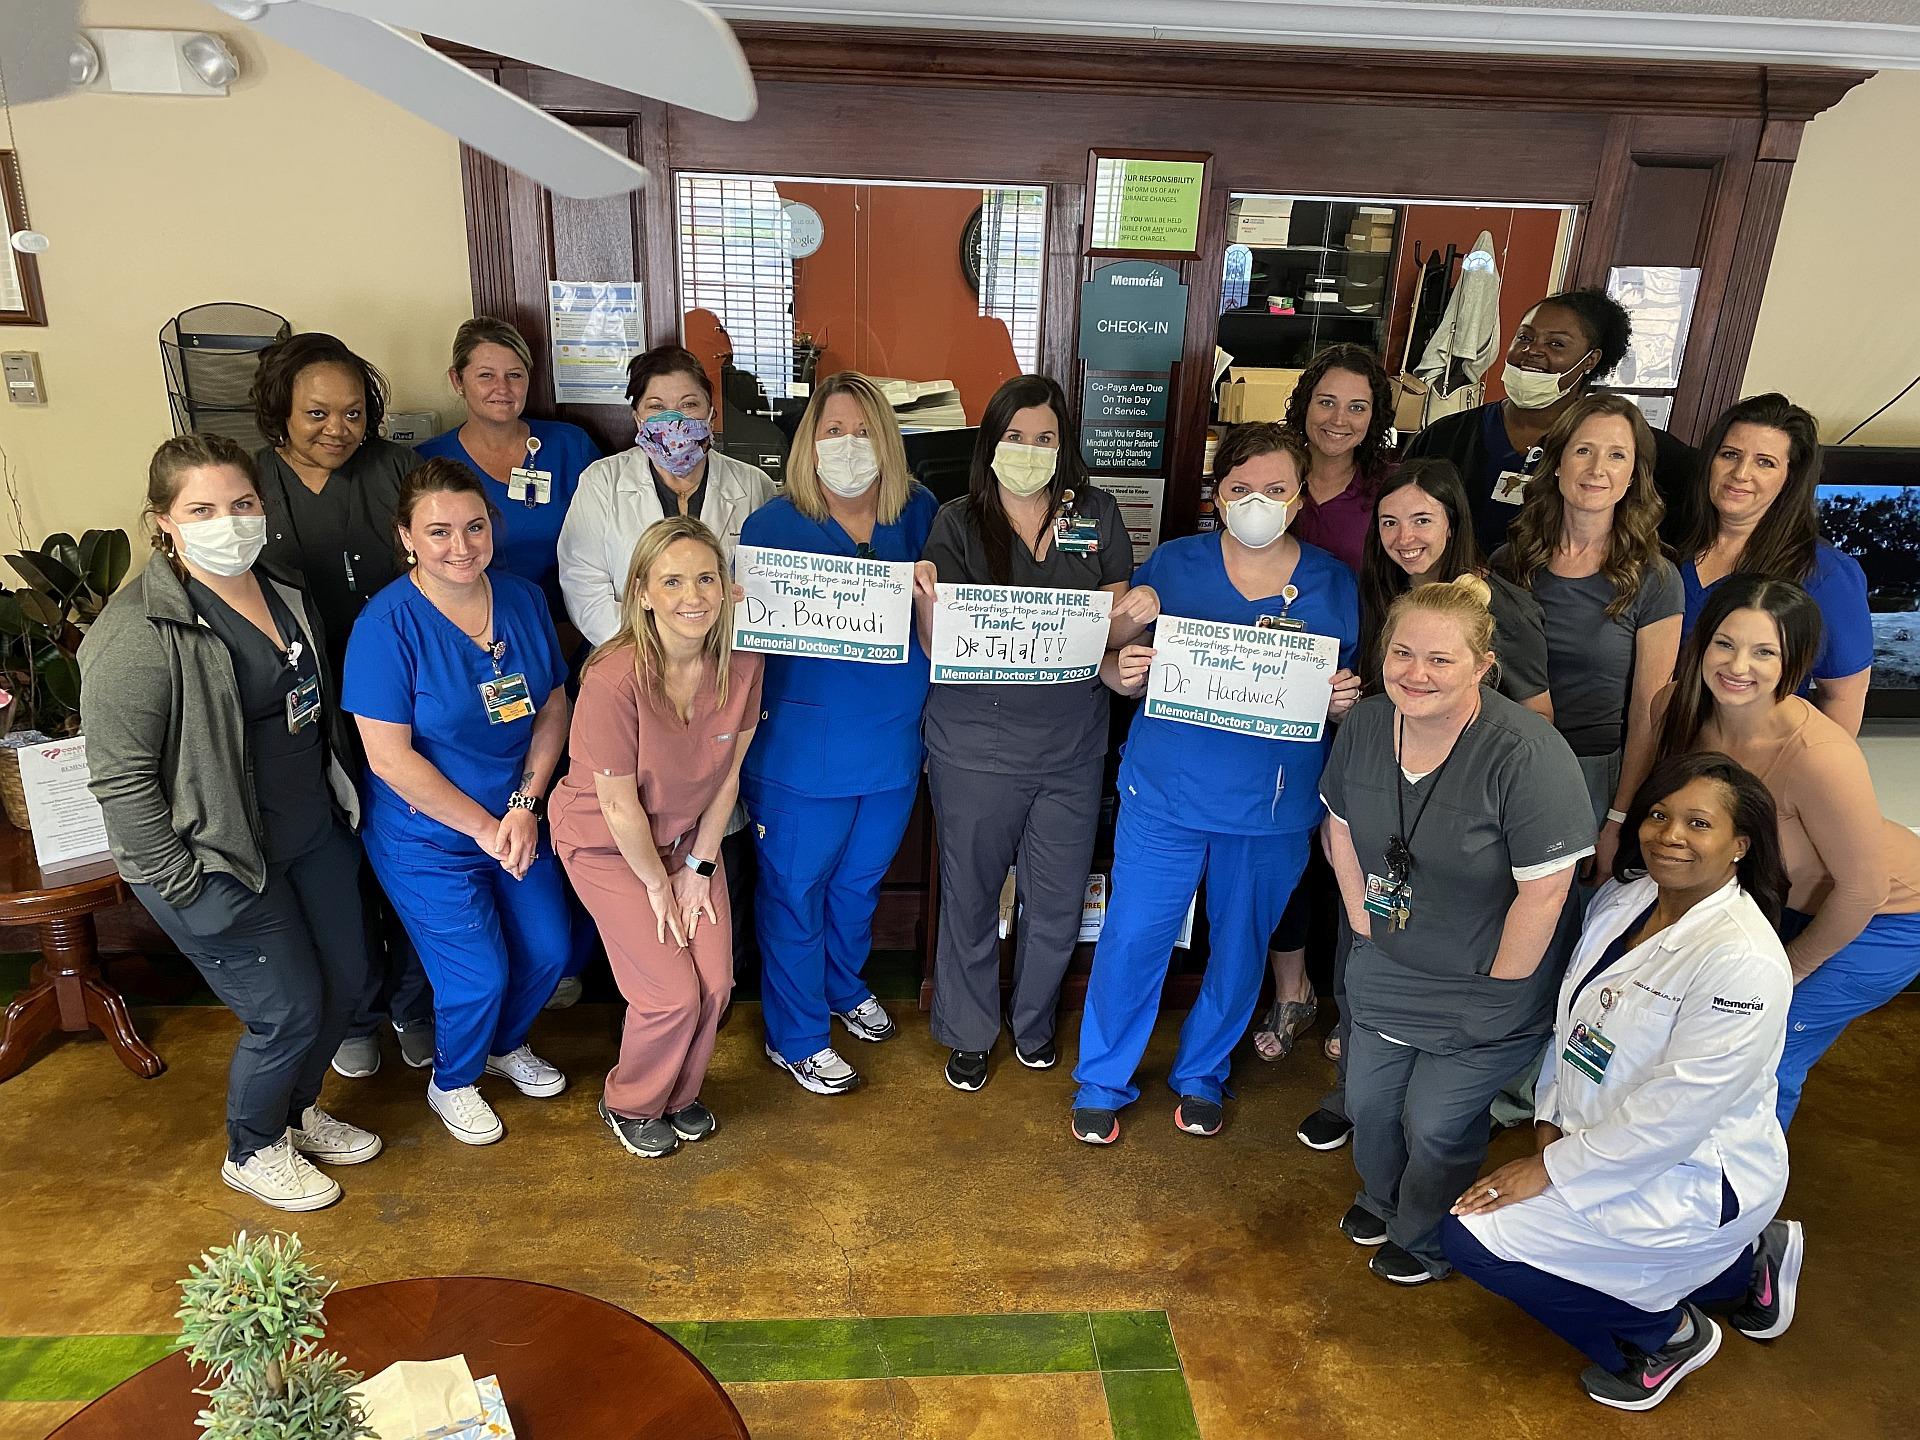 Memorial Coast Heart Institute staff photo